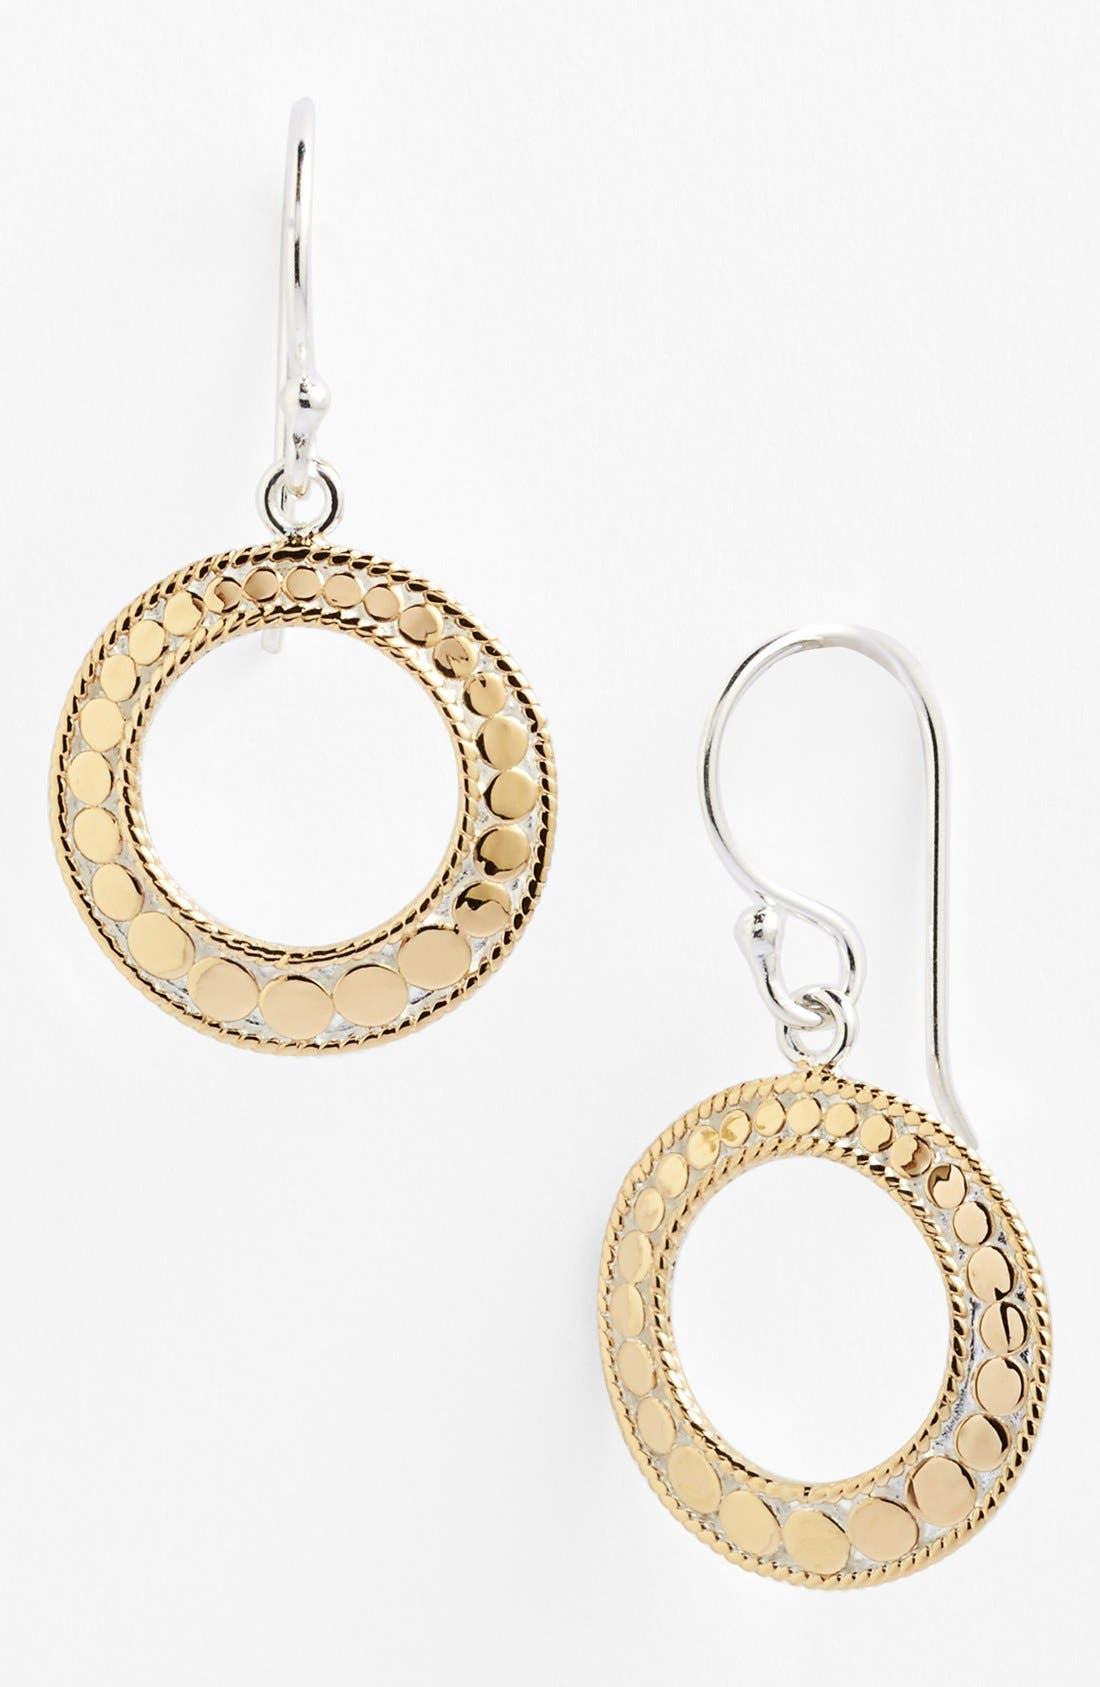 Main Image - Anna Beck 'Gili' Circle Drop Earrings